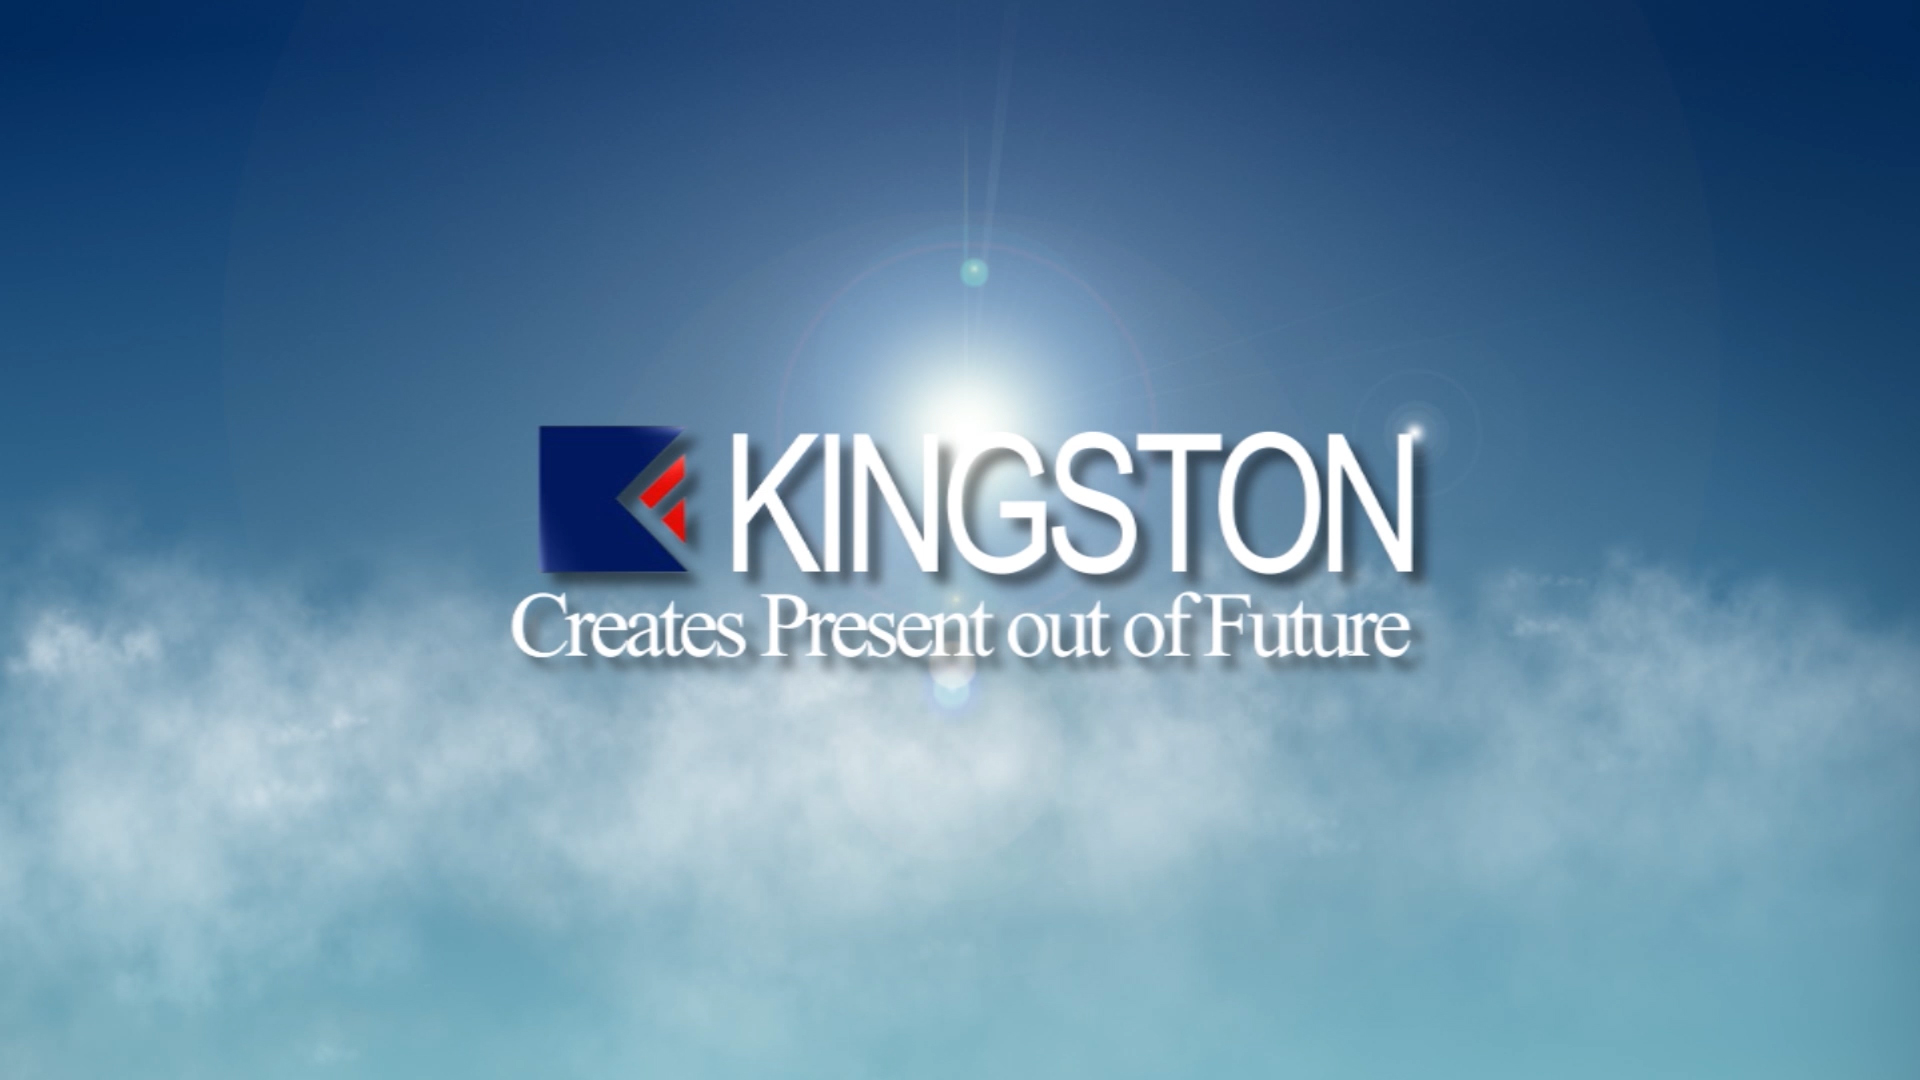 Kingston Bath Fittings - camera-craft